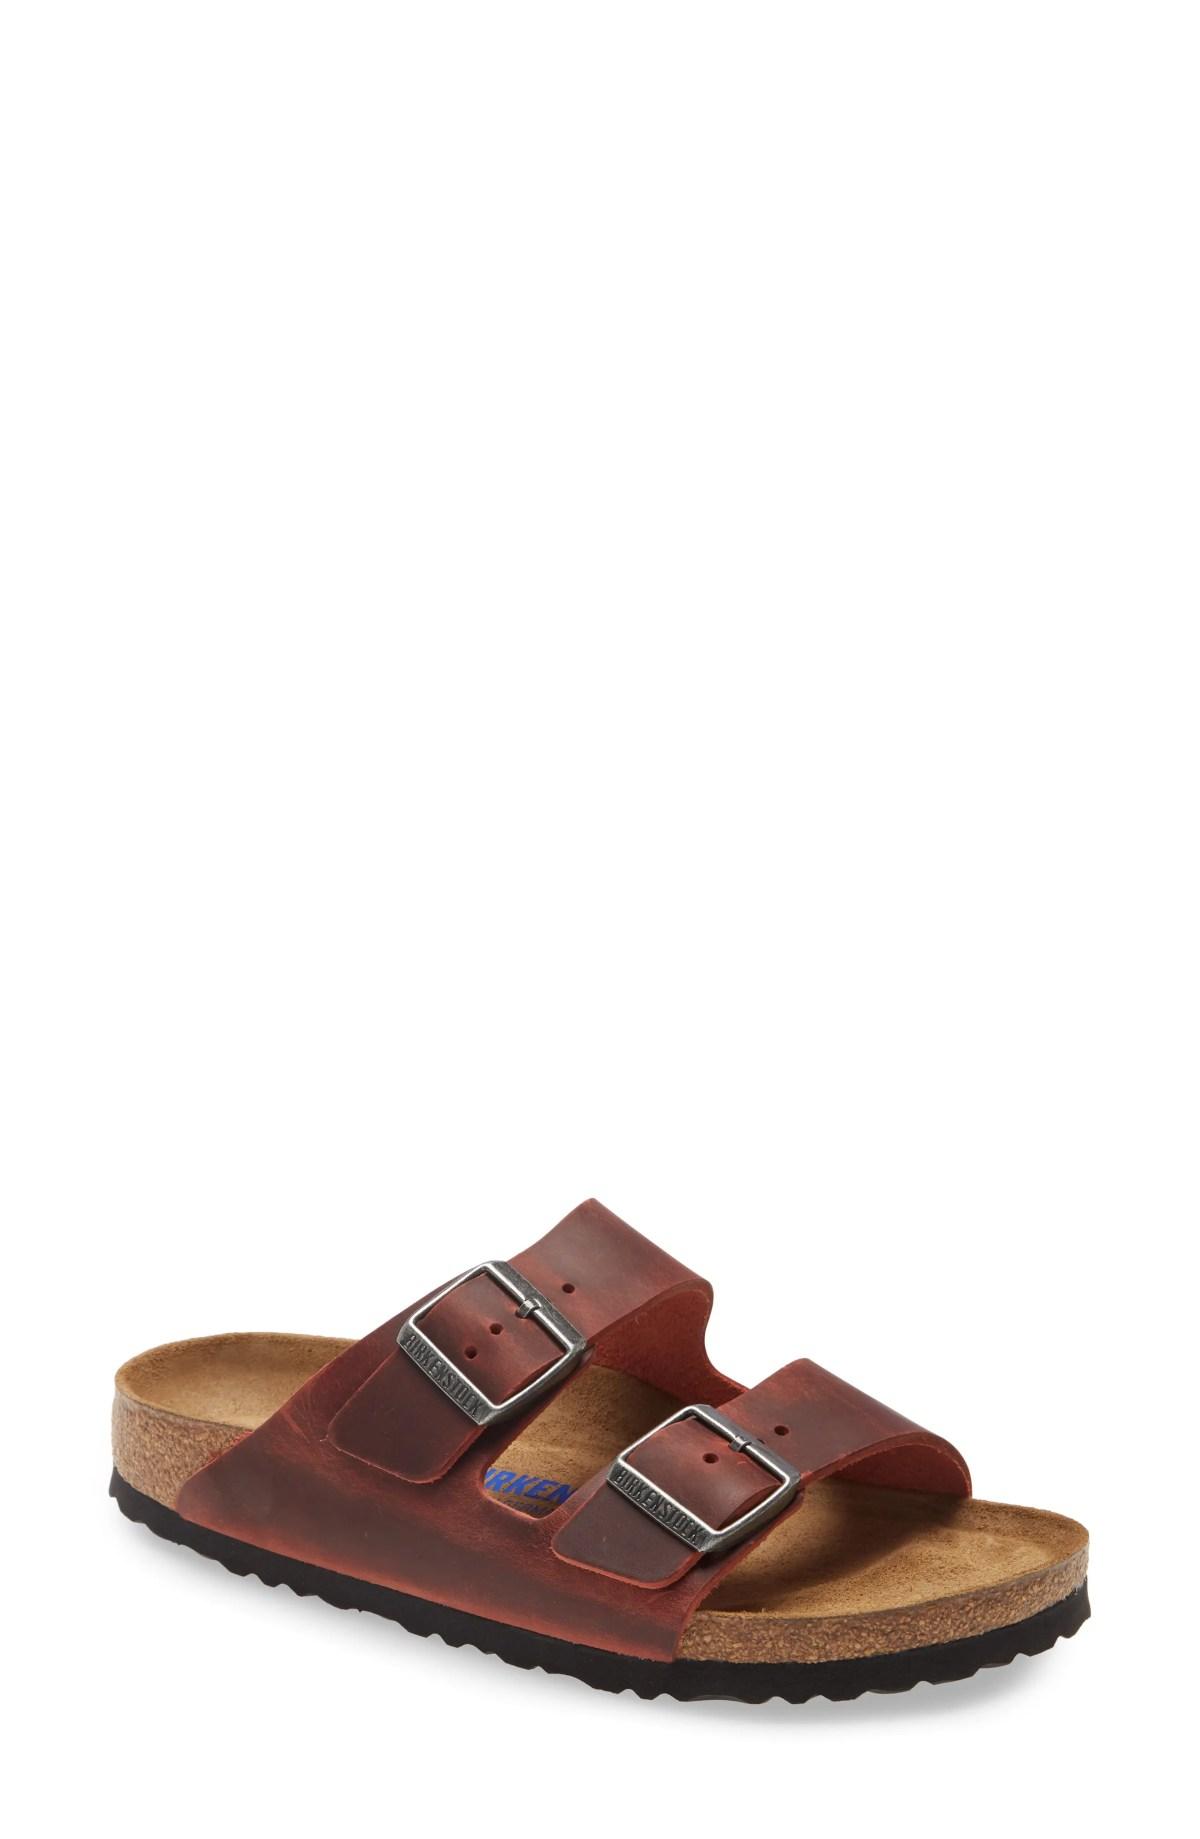 BIRKENSTOCK Arizona Soft Footbed Sandal, Main, color, RED LEATHER